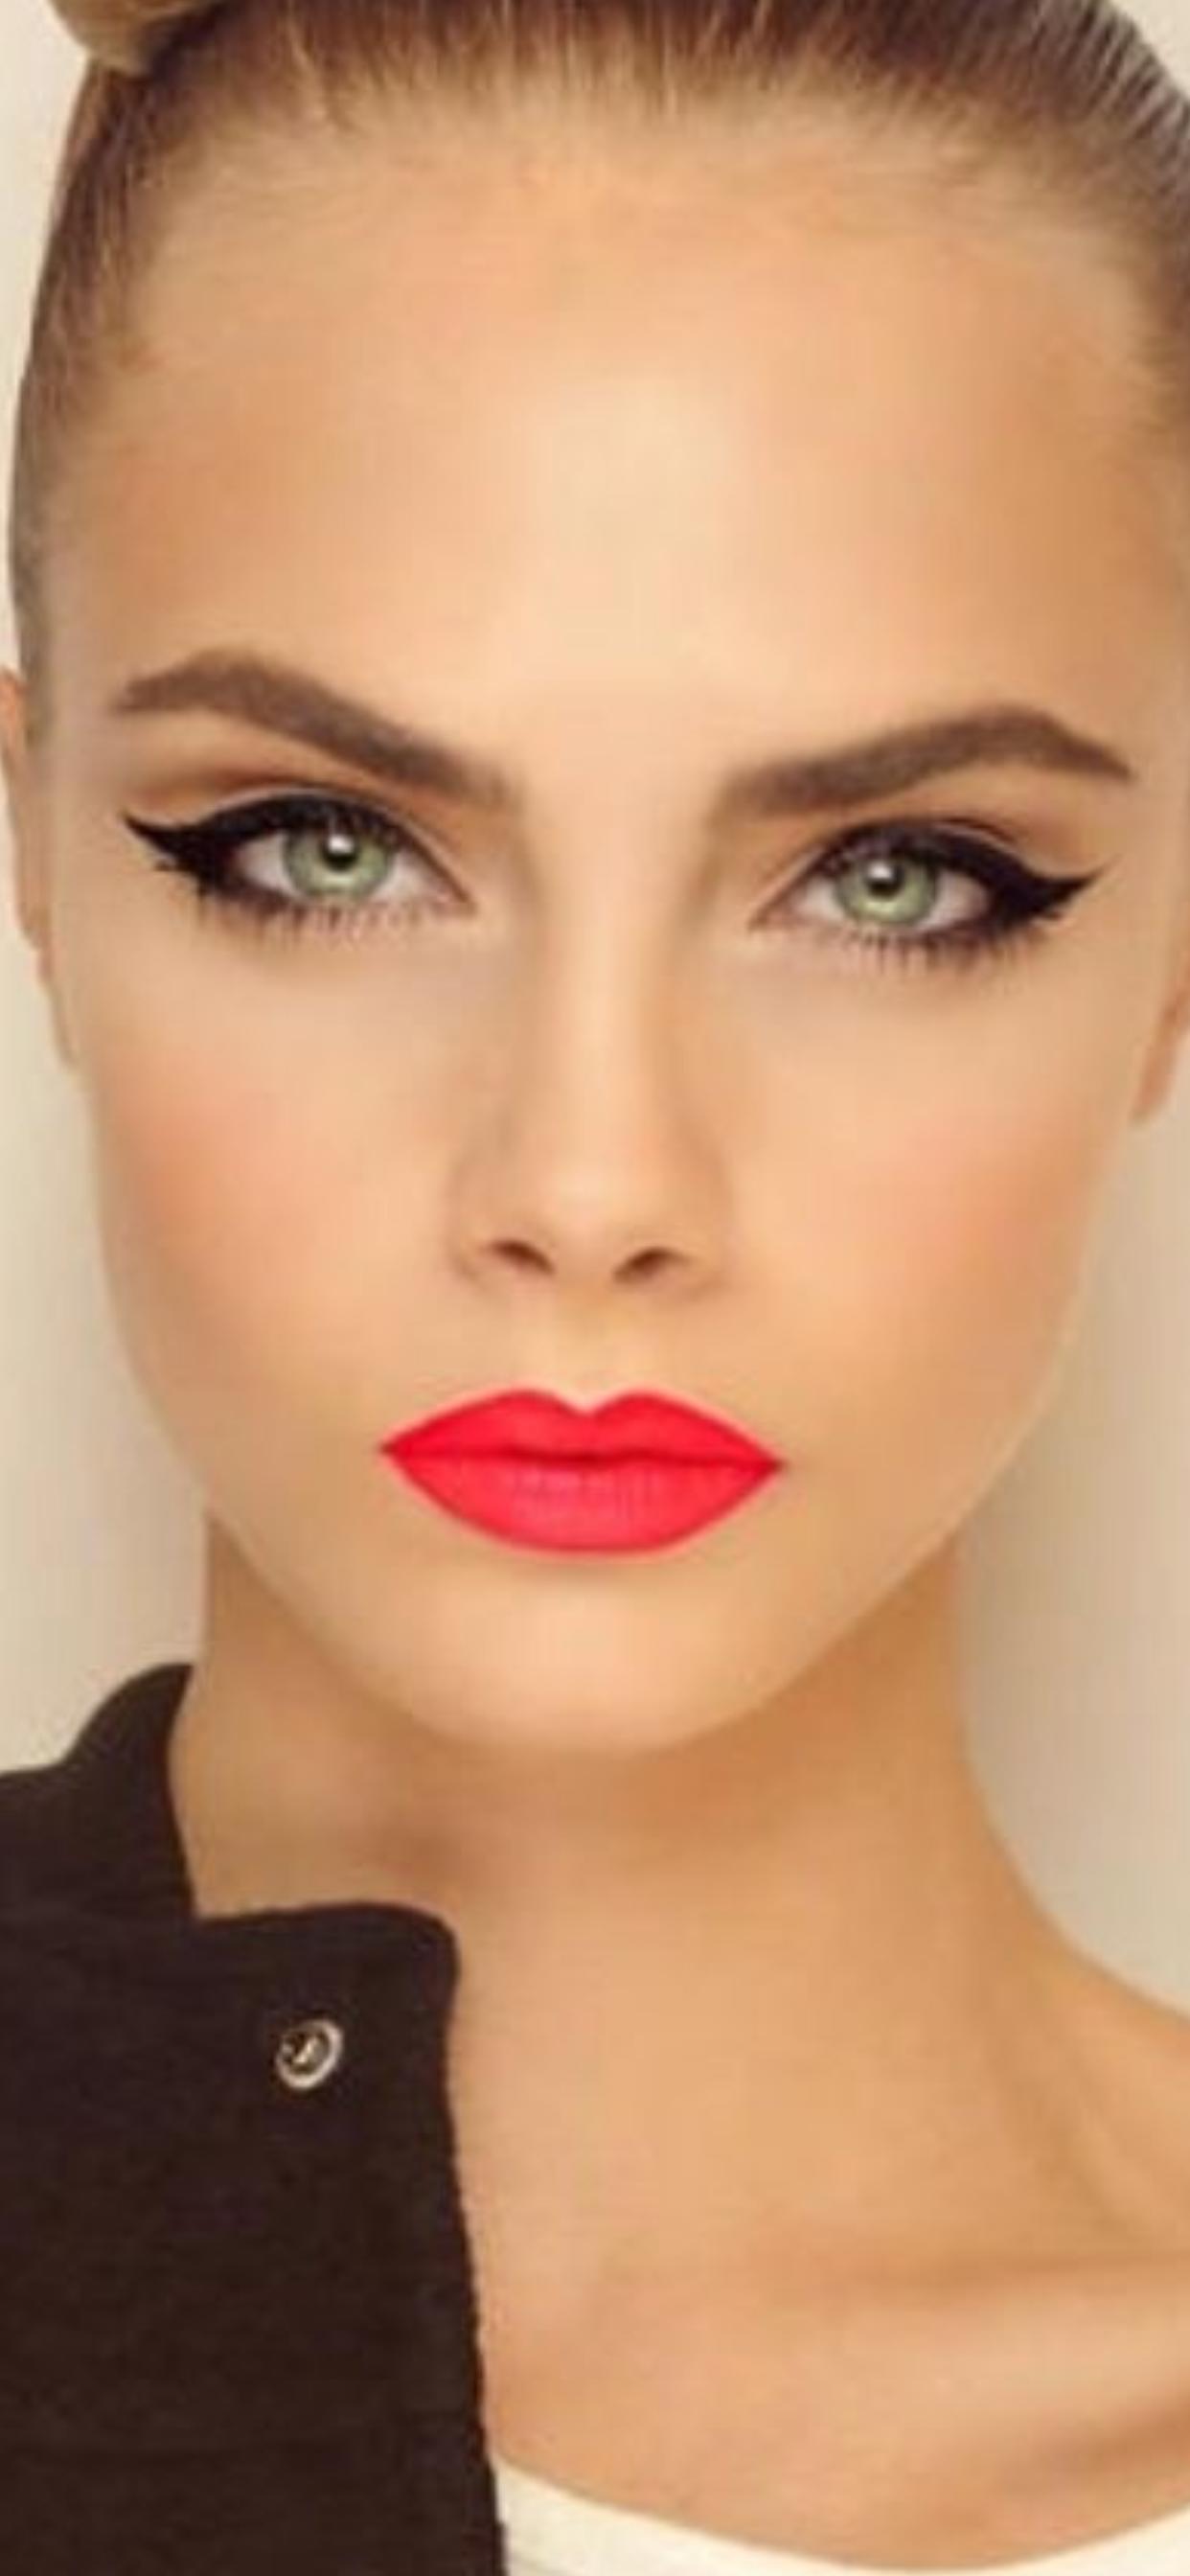 Beauty Winged eyeliner makeup, Red lip makeup, Honey